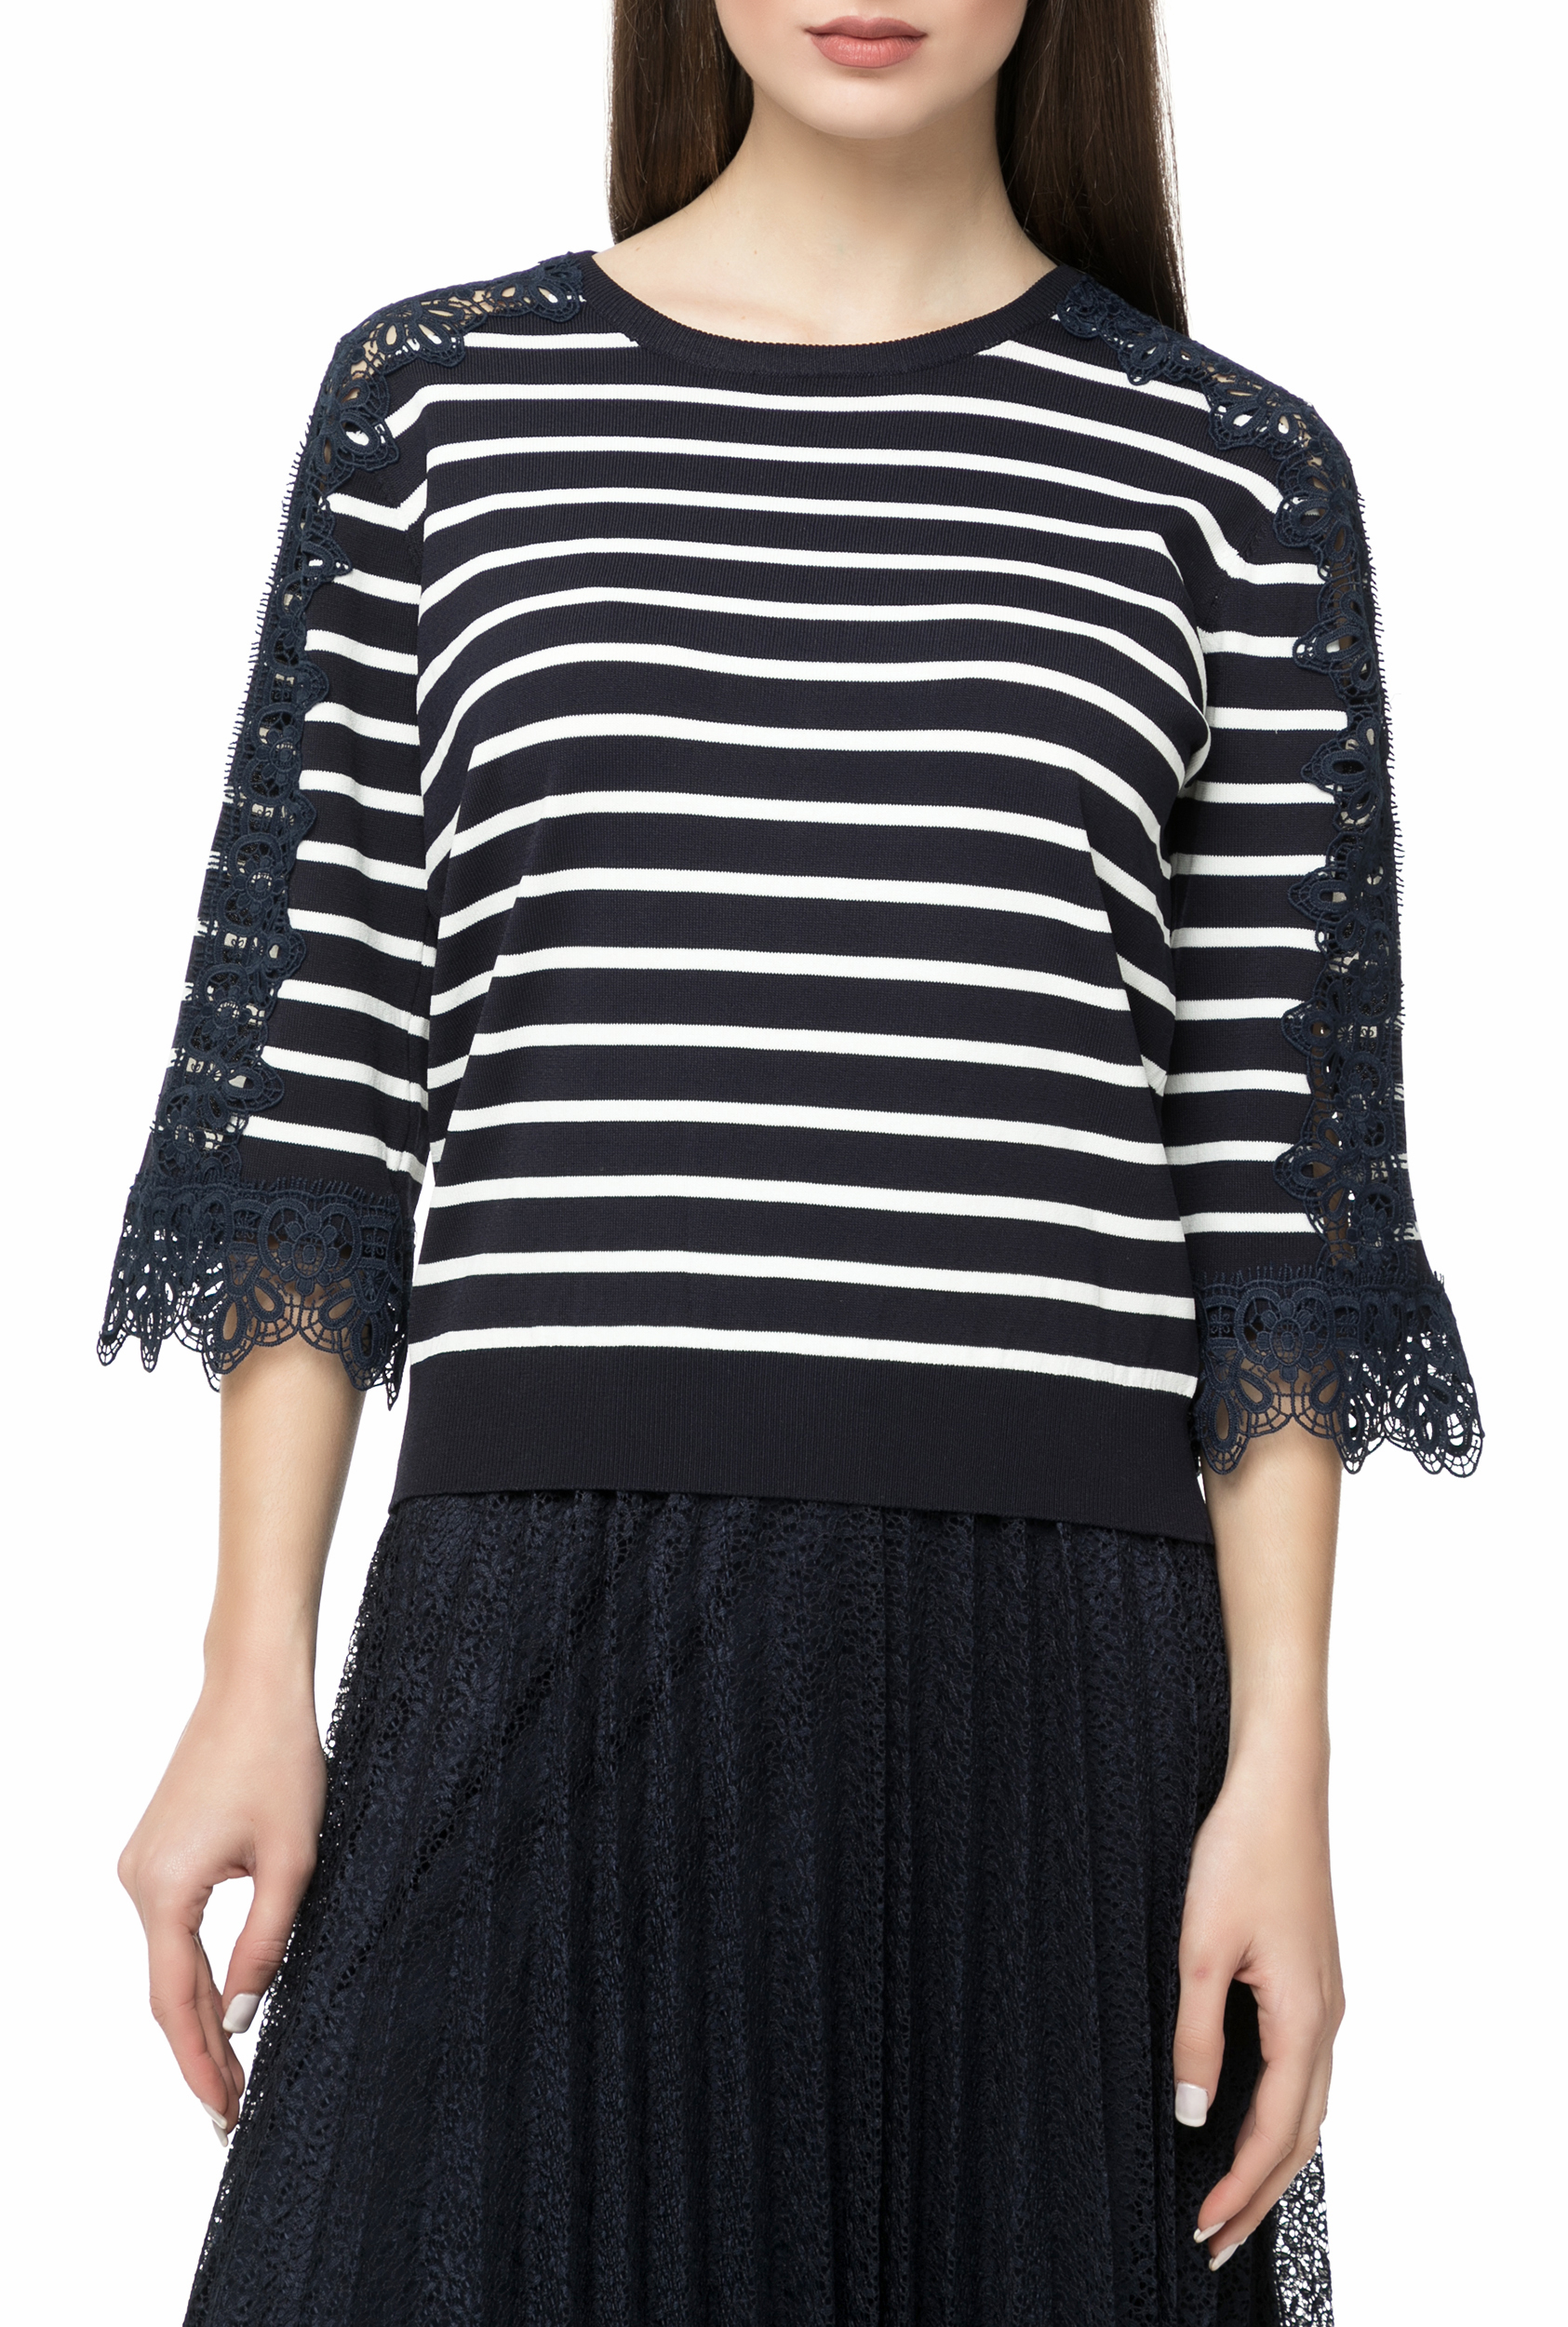 MOLLY BRACKEN - Γυναικεία μακρυμάνικη μπλούζα MOLLY BRACKEN μπλε με ριγέ μοτίβο γυναικεία ρούχα μπλούζες μακρυμάνικες